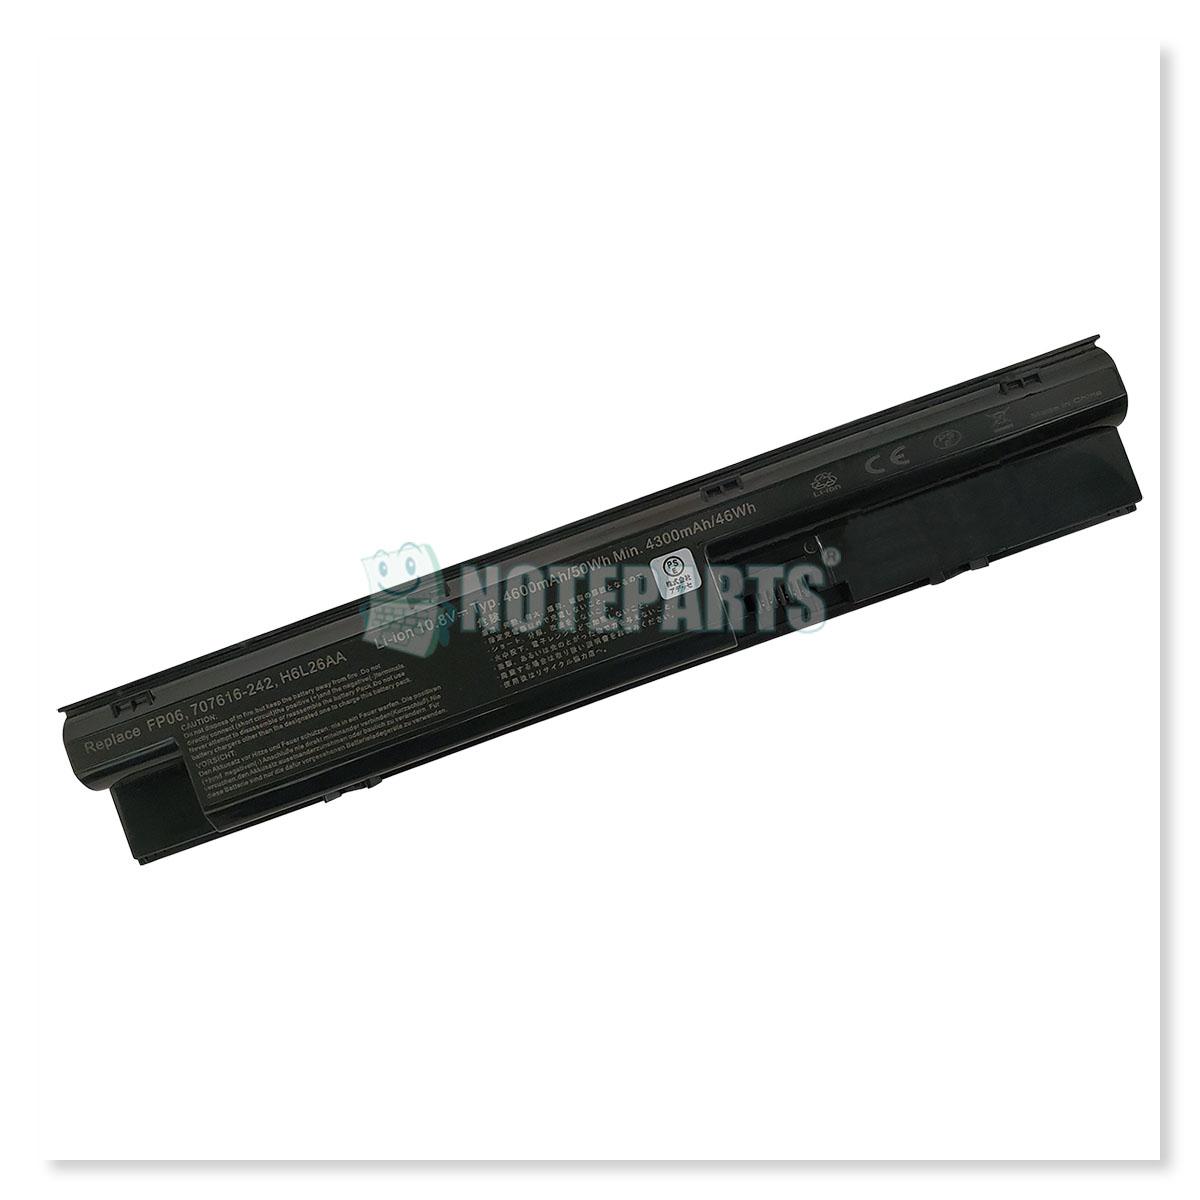 HP ProBook 450 G1 455 G1 470 G1 470 G2 バッテリー H6L26AA FP06対応